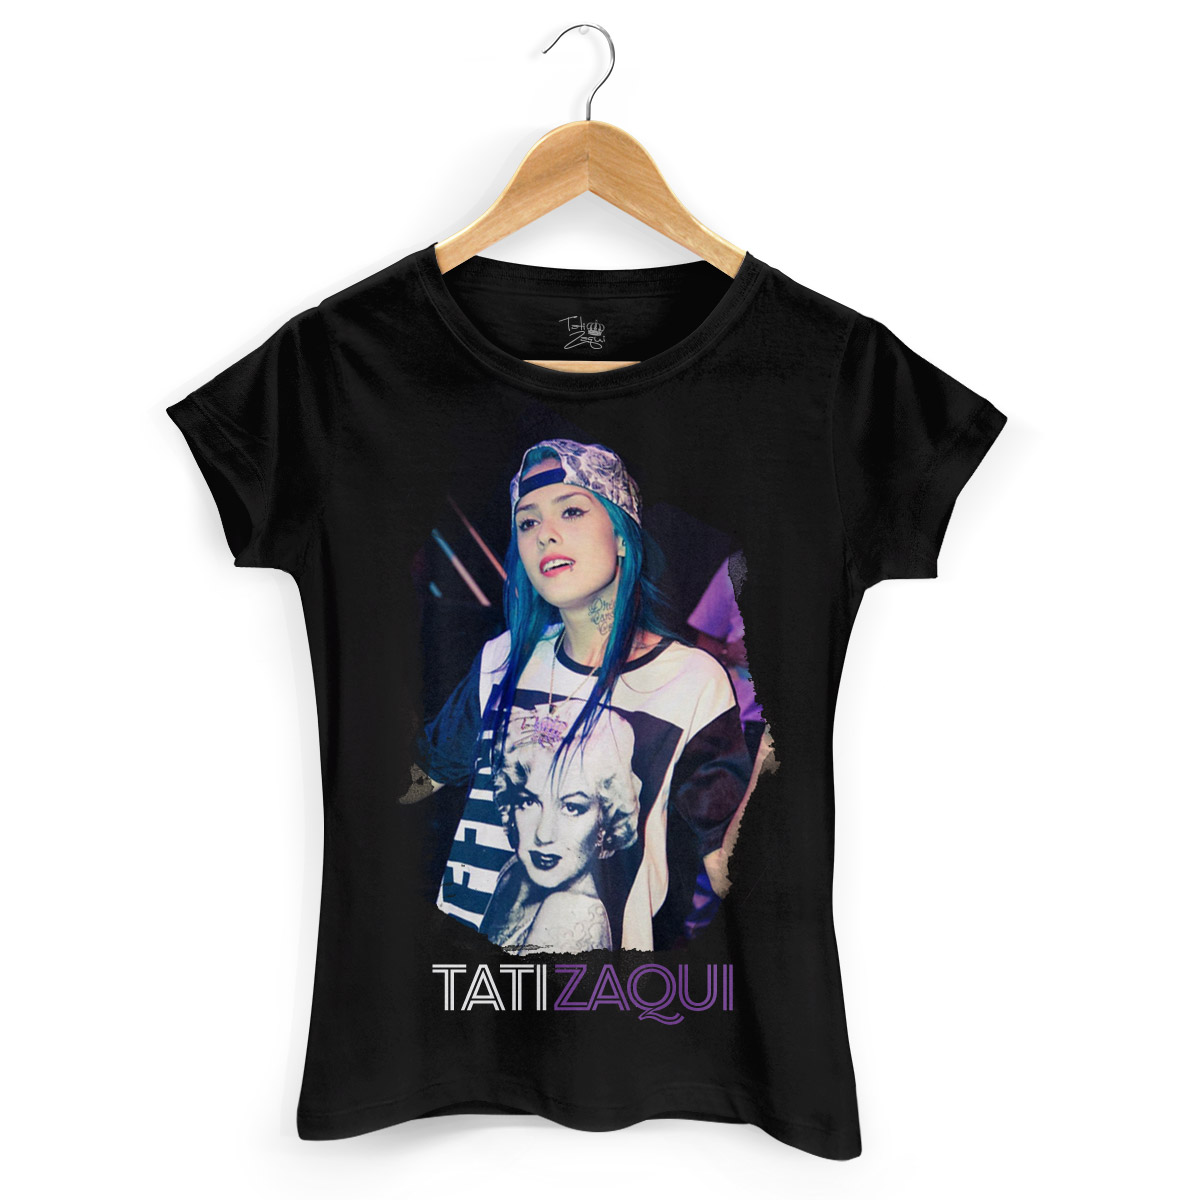 Camiseta Feminina MC Tati Zaqui Foto